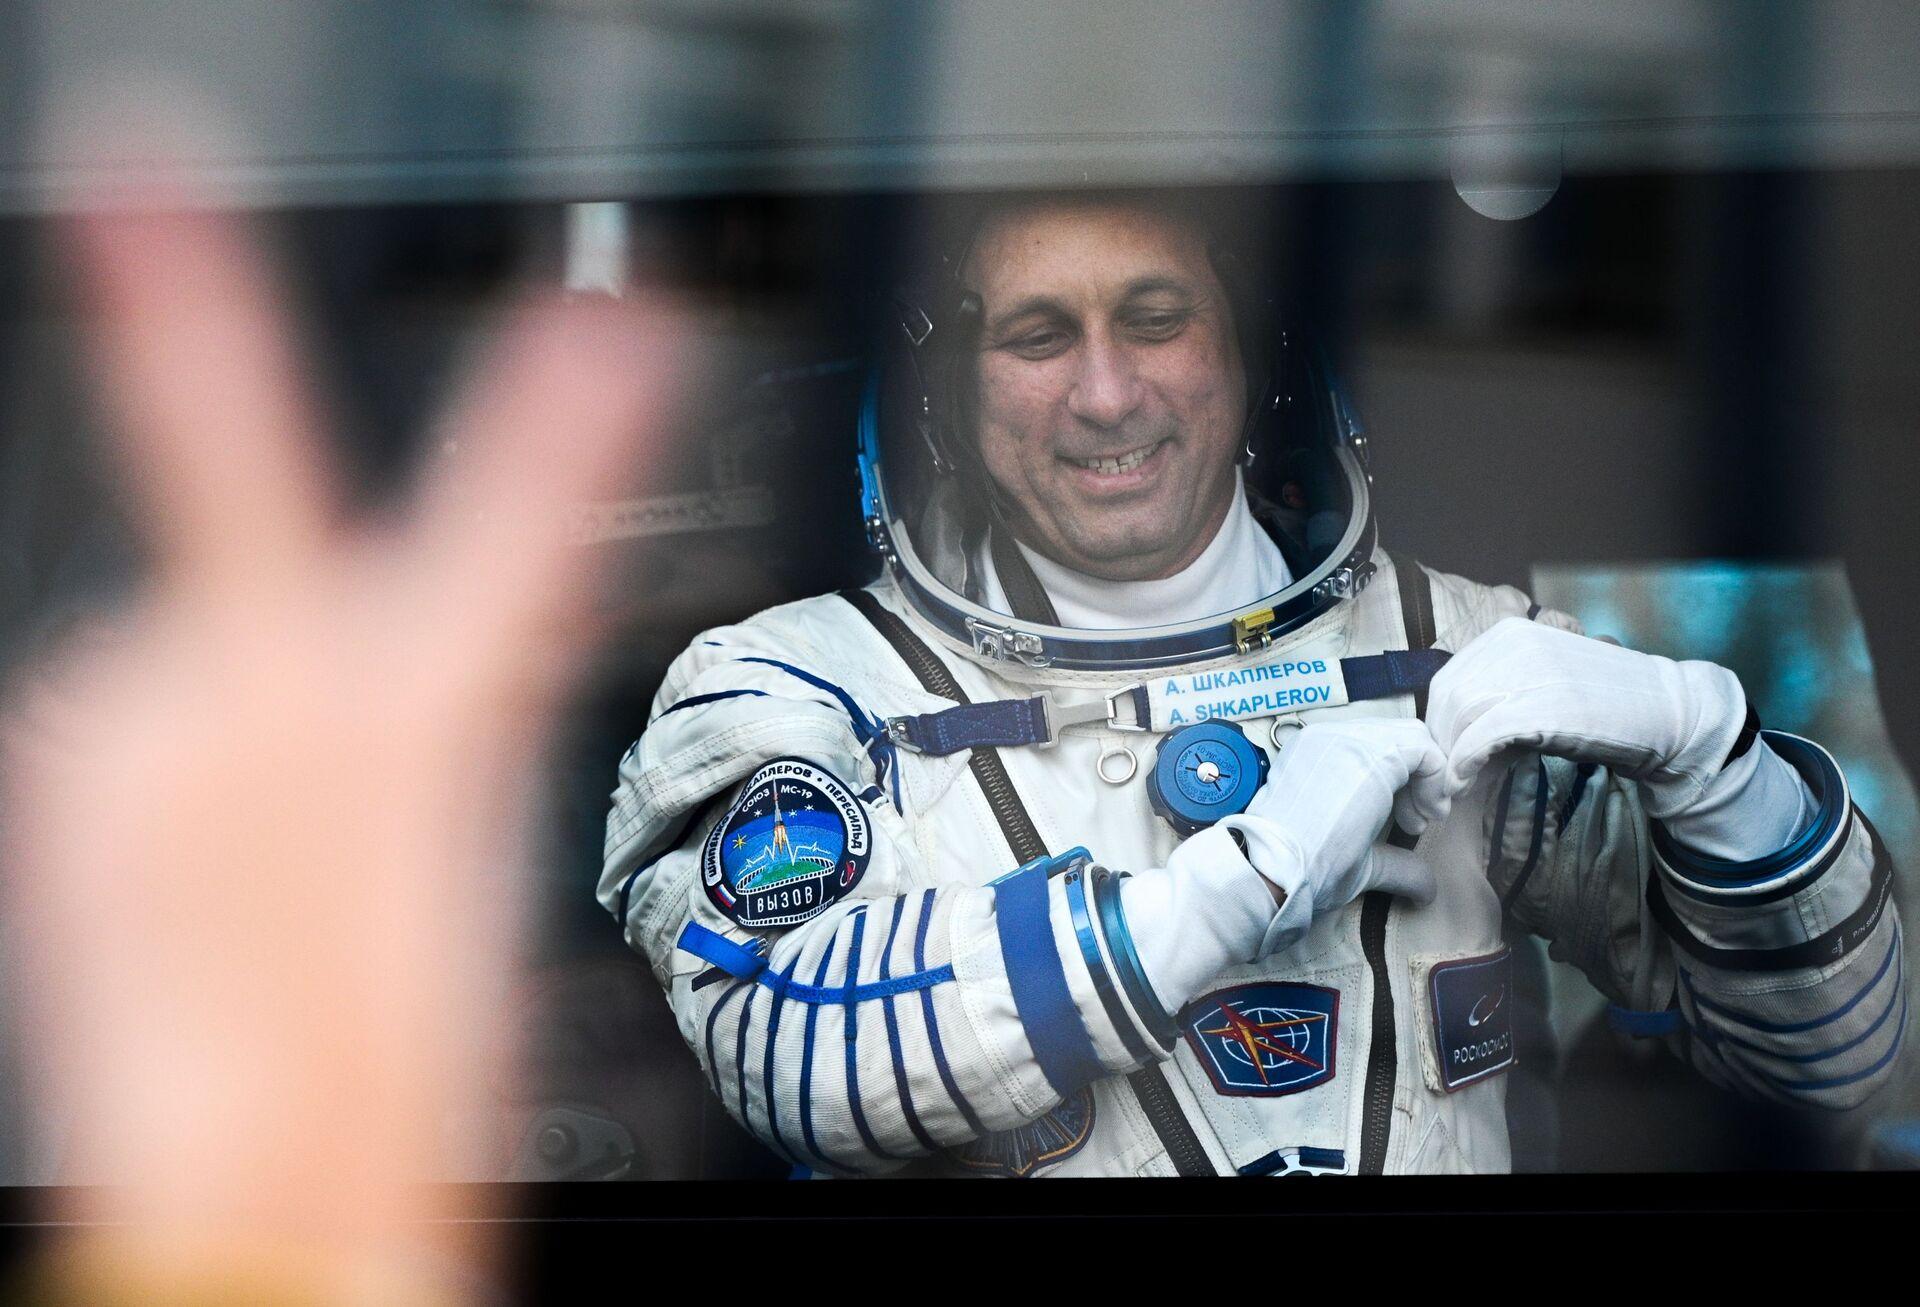 Kosmonavt Anton Škaplerov pered startom kosmičeskogo korablя Soюz MS-19 na kosmodrome Baйkonur - Sputnik Srbija, 1920, 05.10.2021